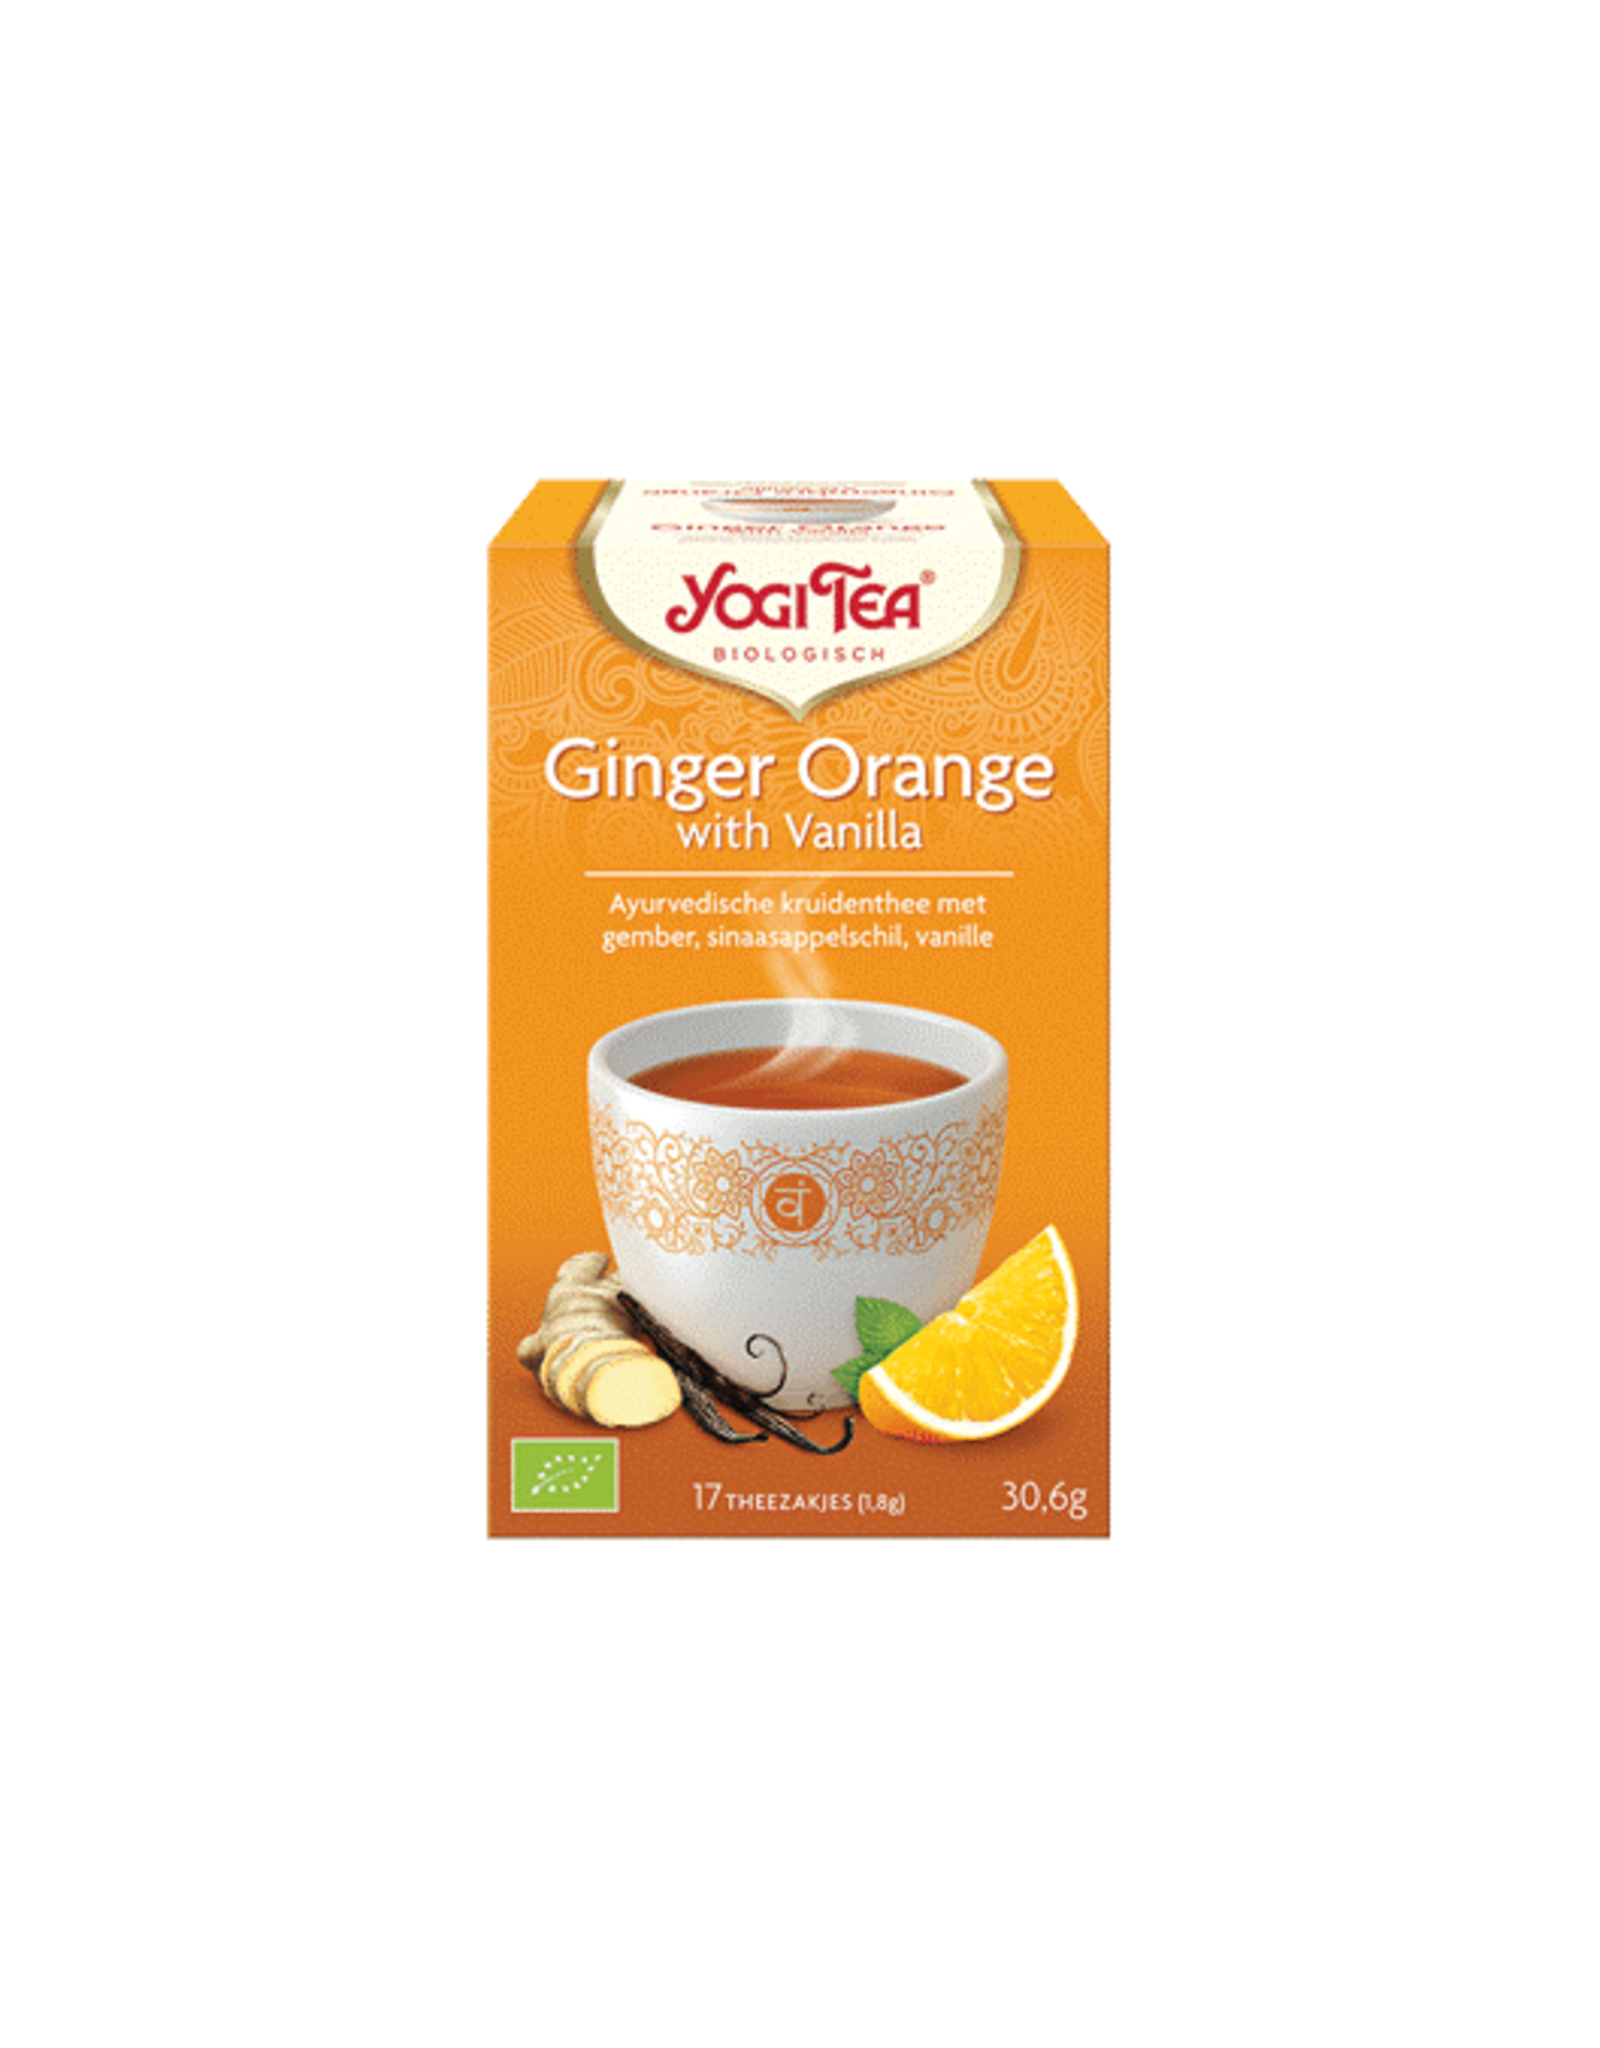 Yogi Tea Ginger Orange